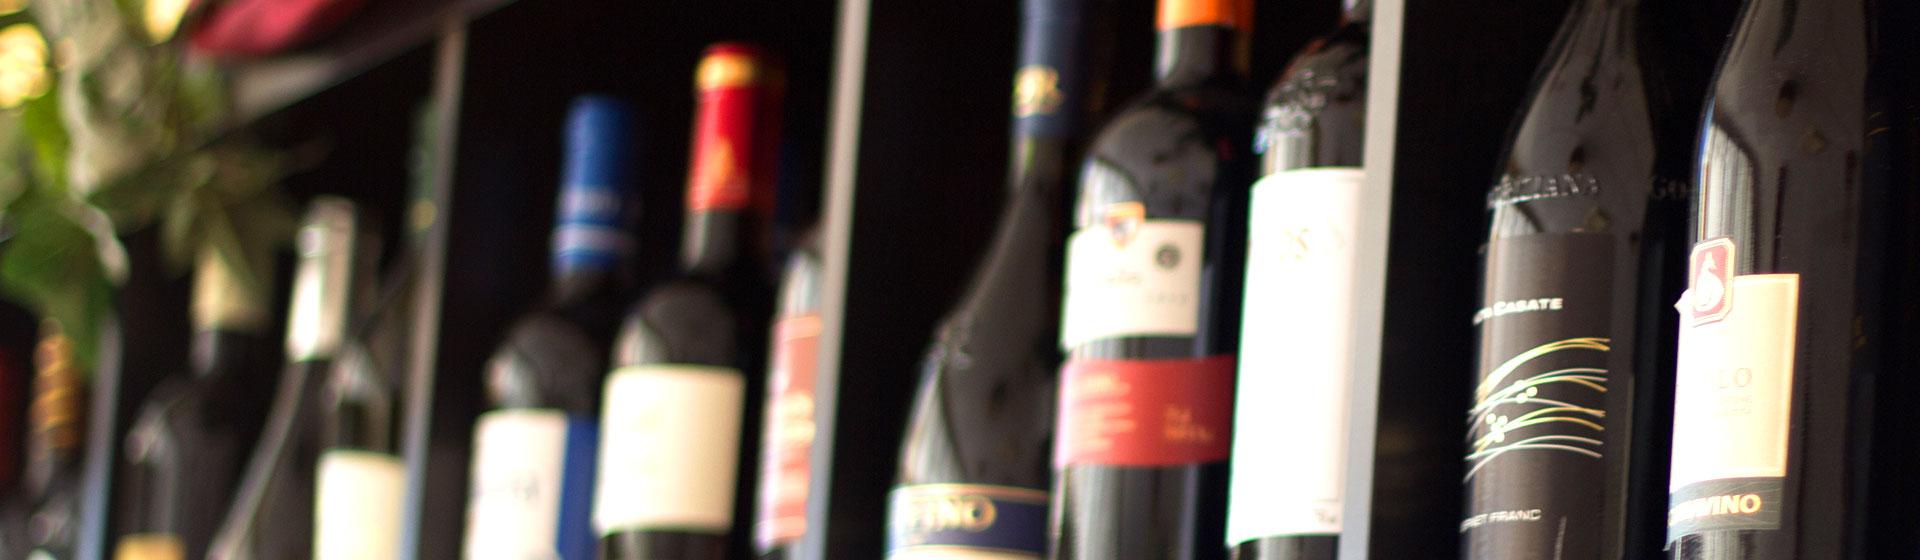 slide_vino_pizzeria-restaurante_erik_lanzarote